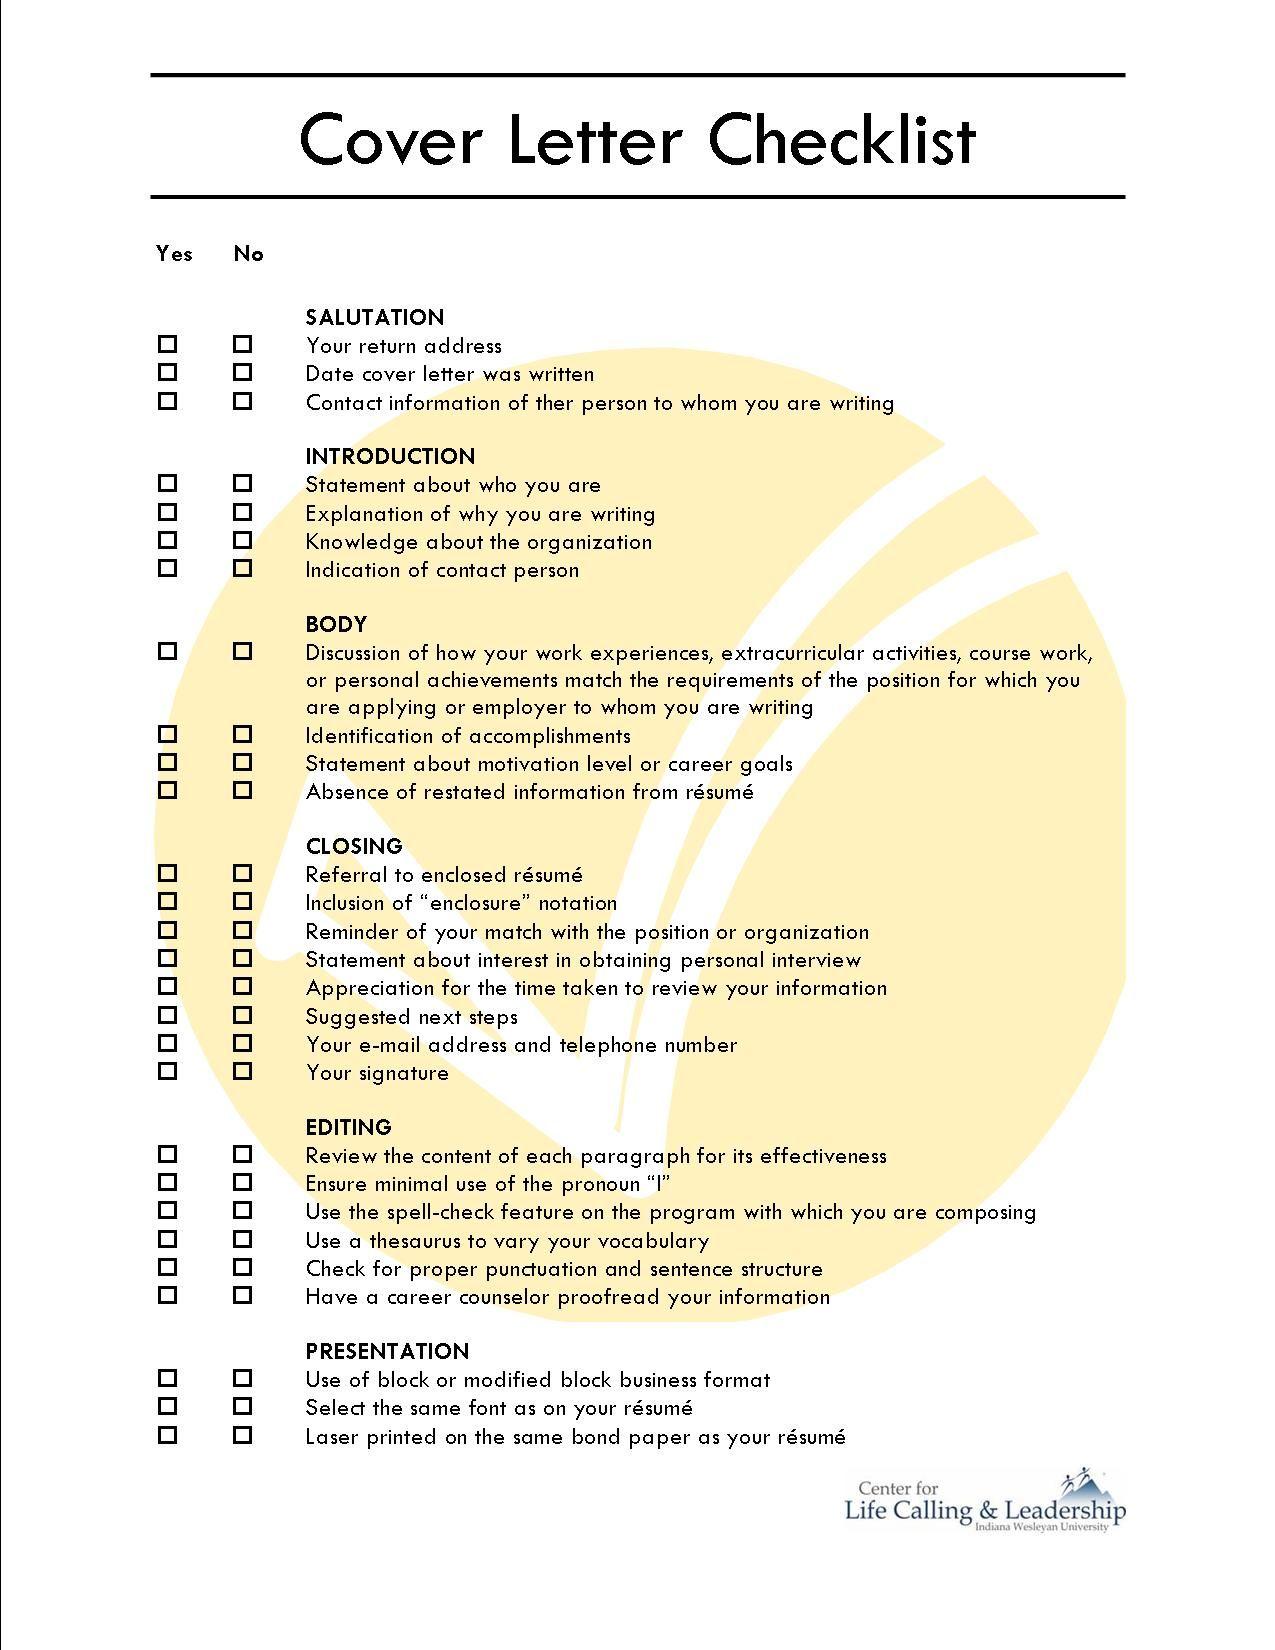 cover letter checklist Cover letter, Cover letter for